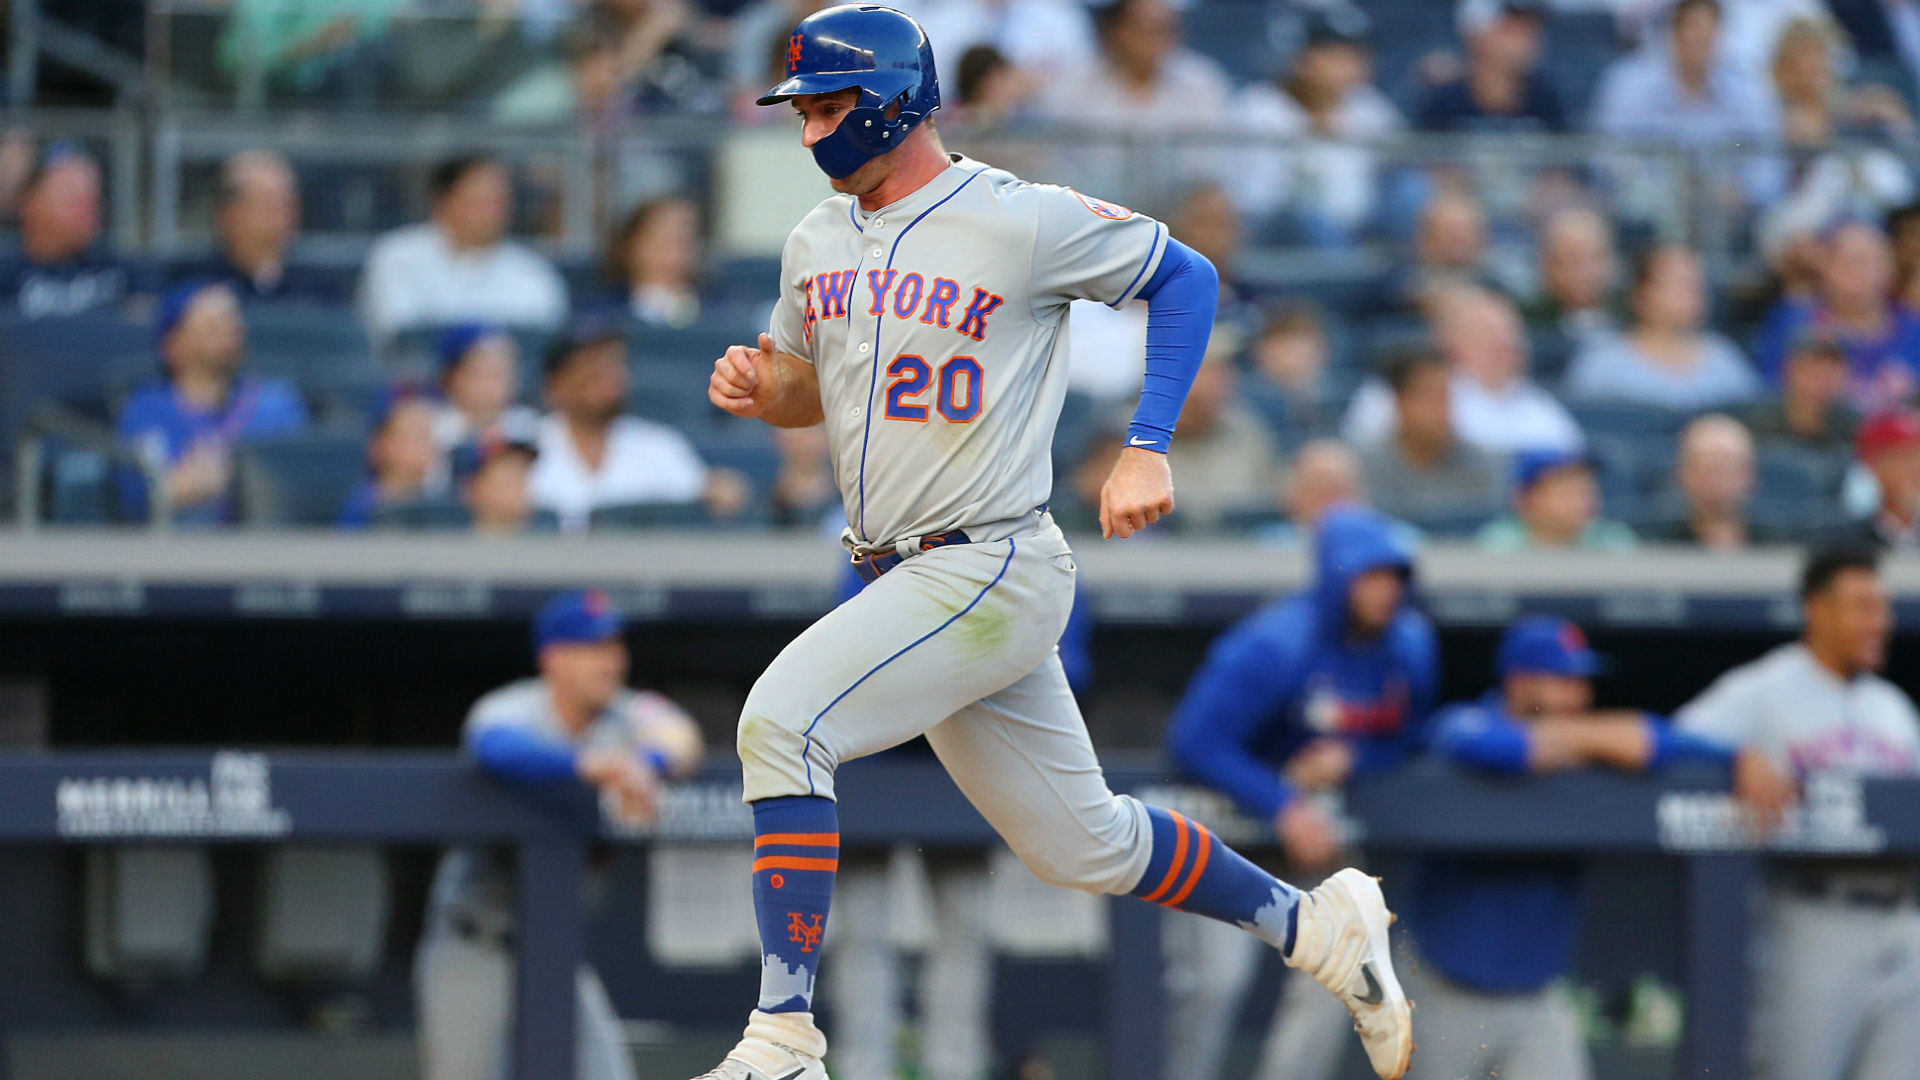 Mets, Yankees trade double-digit scores to split DH ...  Yankees